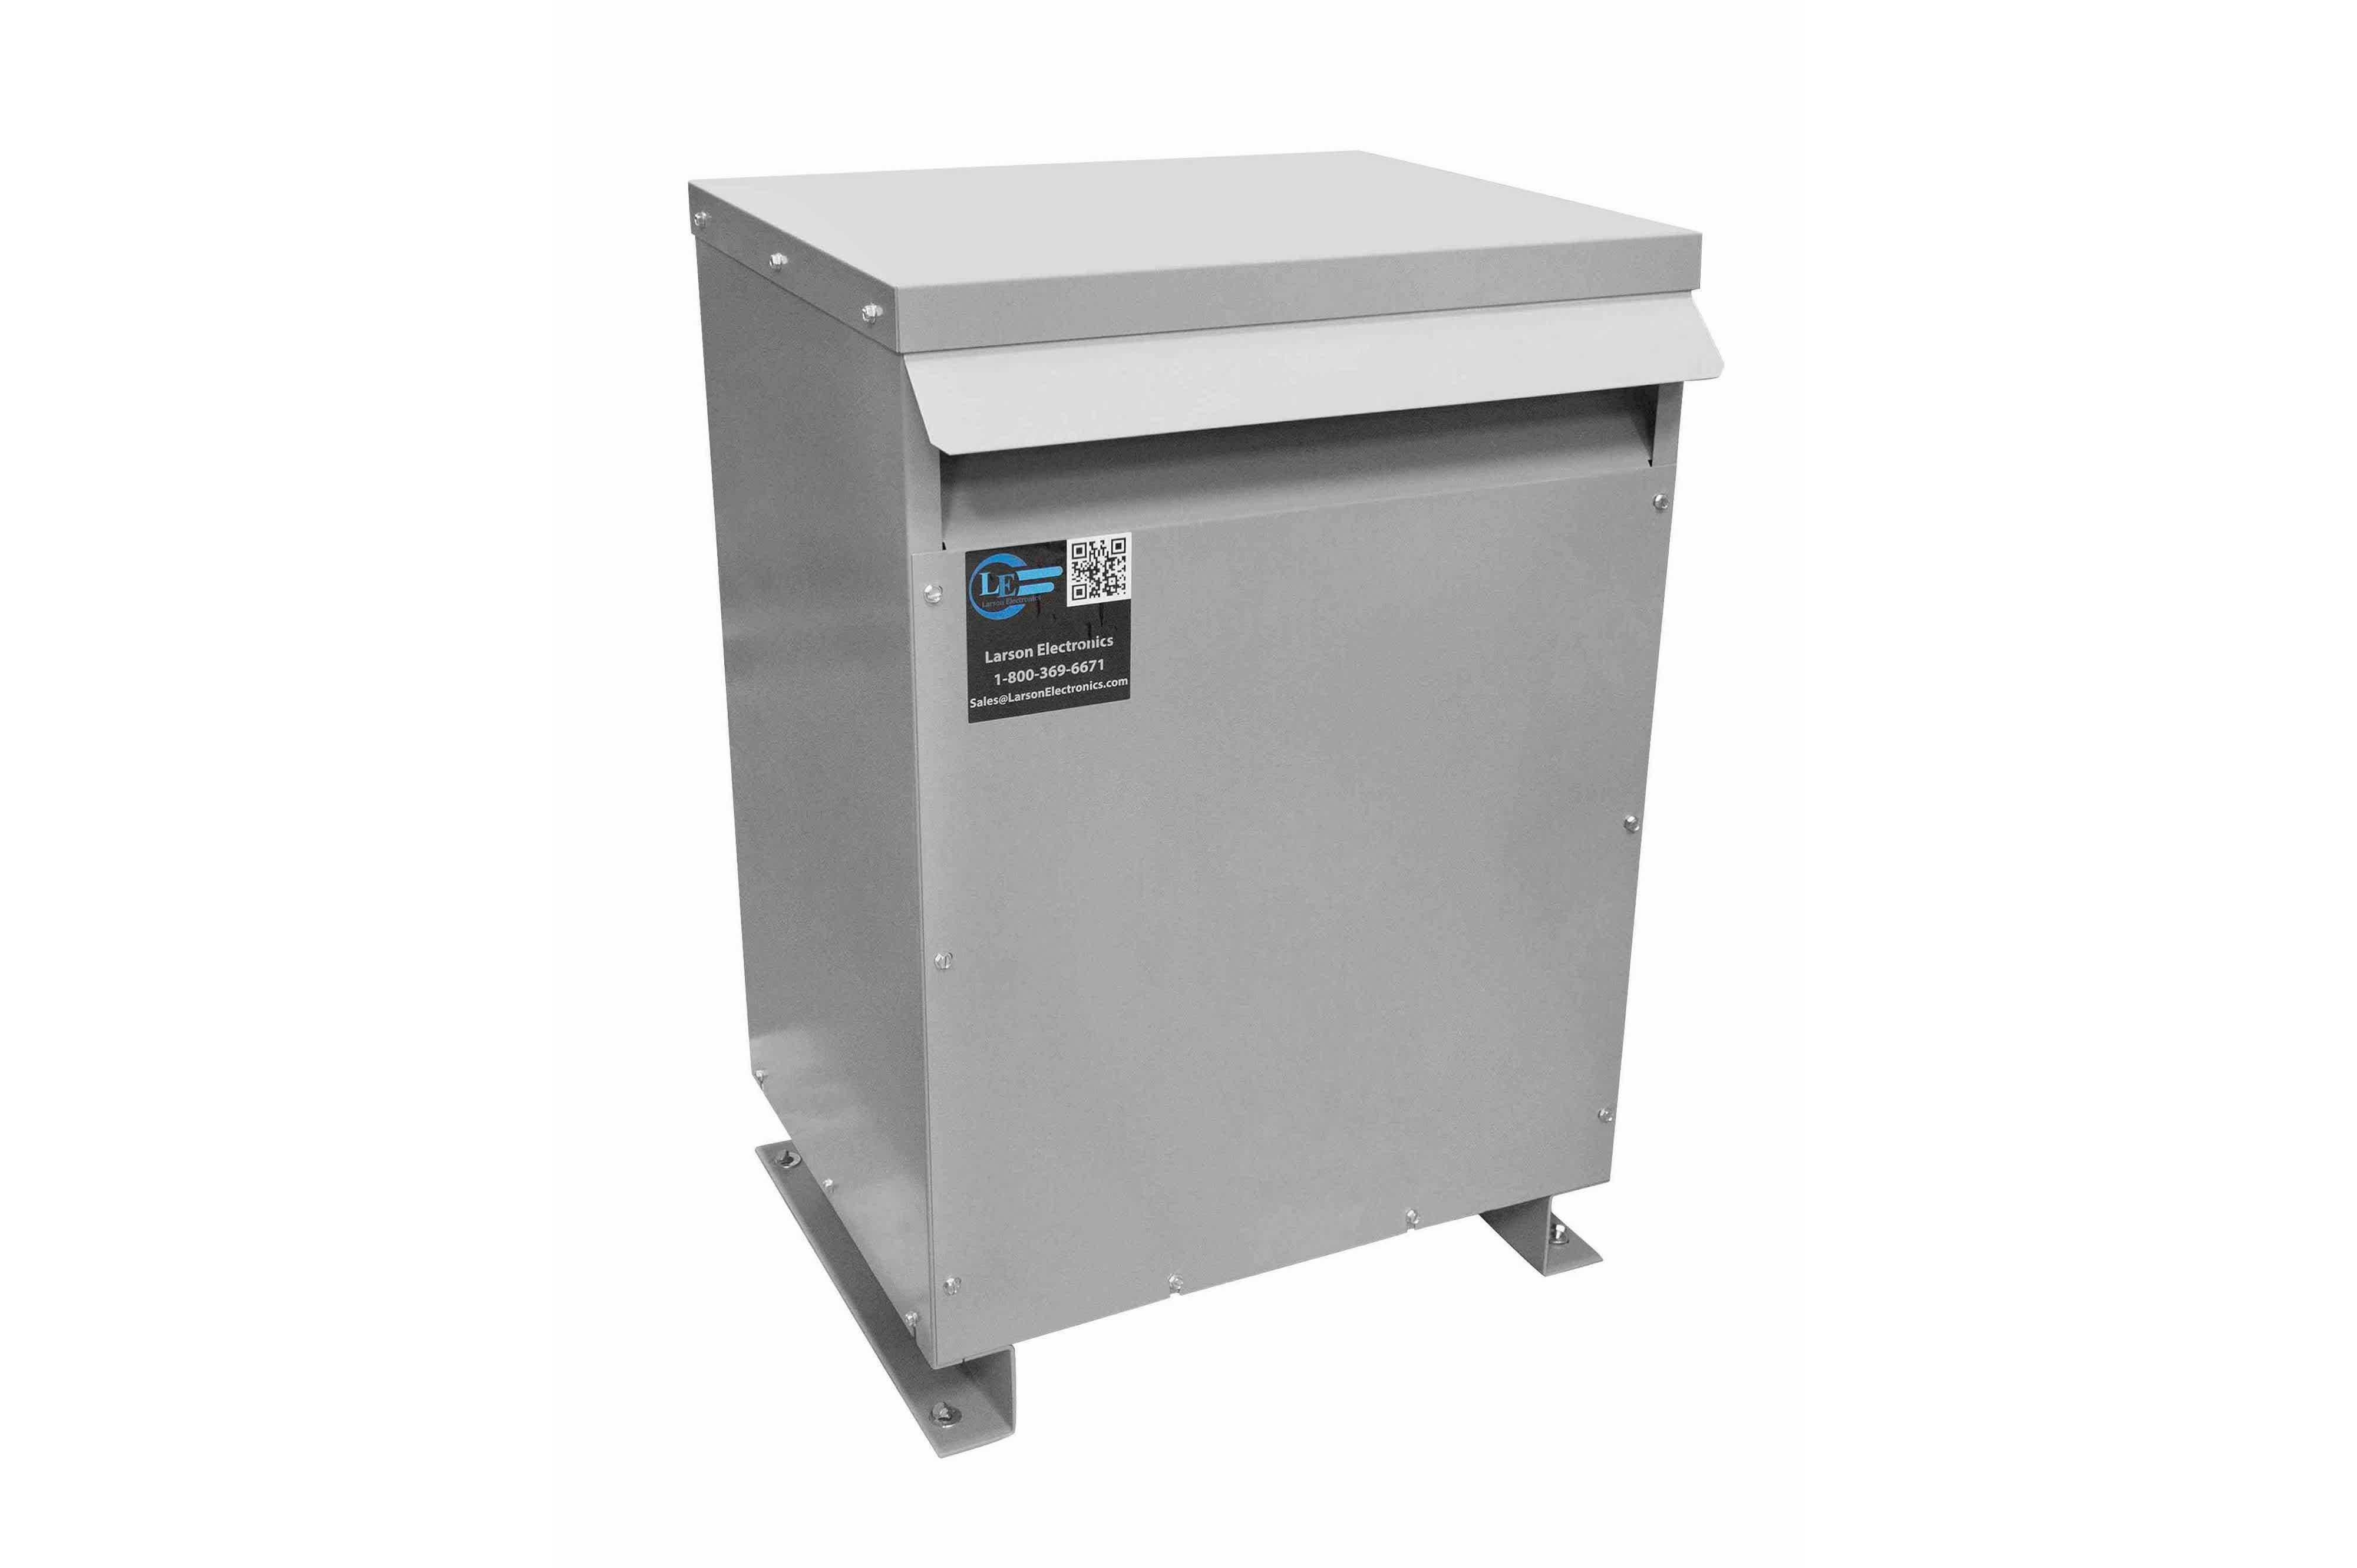 237.5 kVA 3PH Isolation Transformer, 460V Wye Primary, 208Y/120 Wye-N Secondary, N3R, Ventilated, 60 Hz